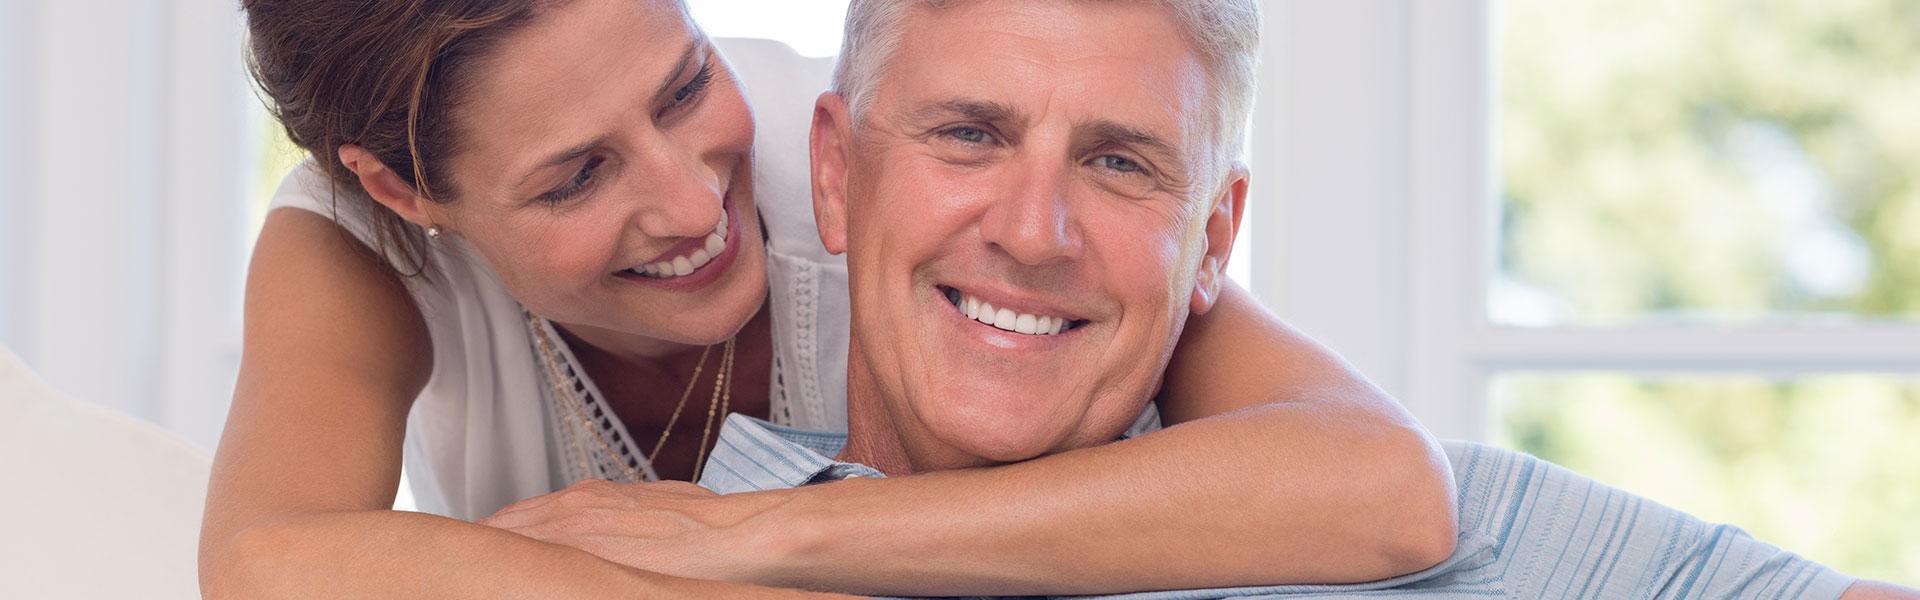 Happy couple with beautiful teeth